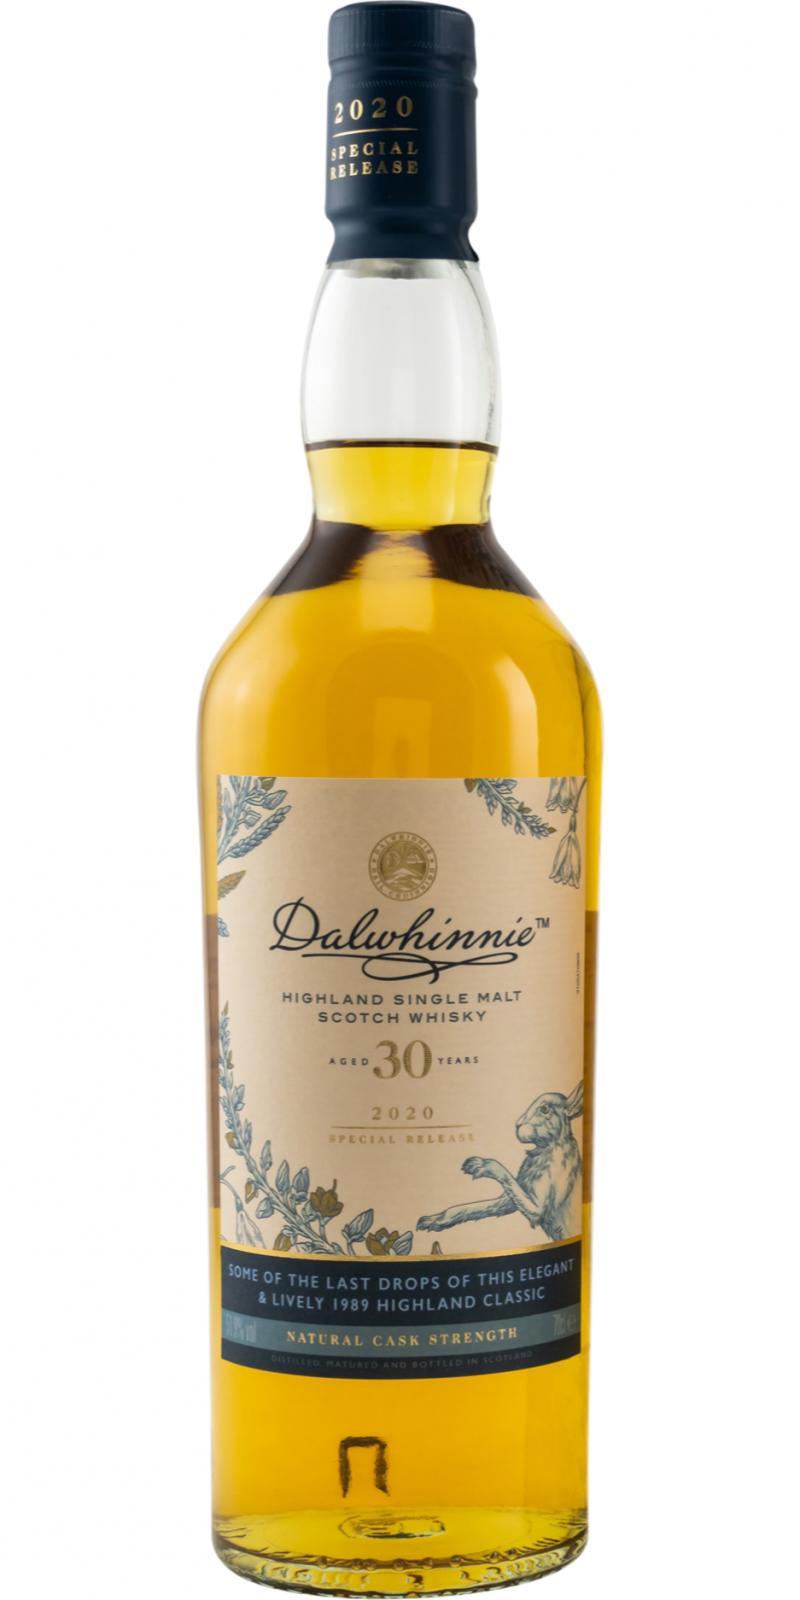 Dalwhinnie 30-year-old